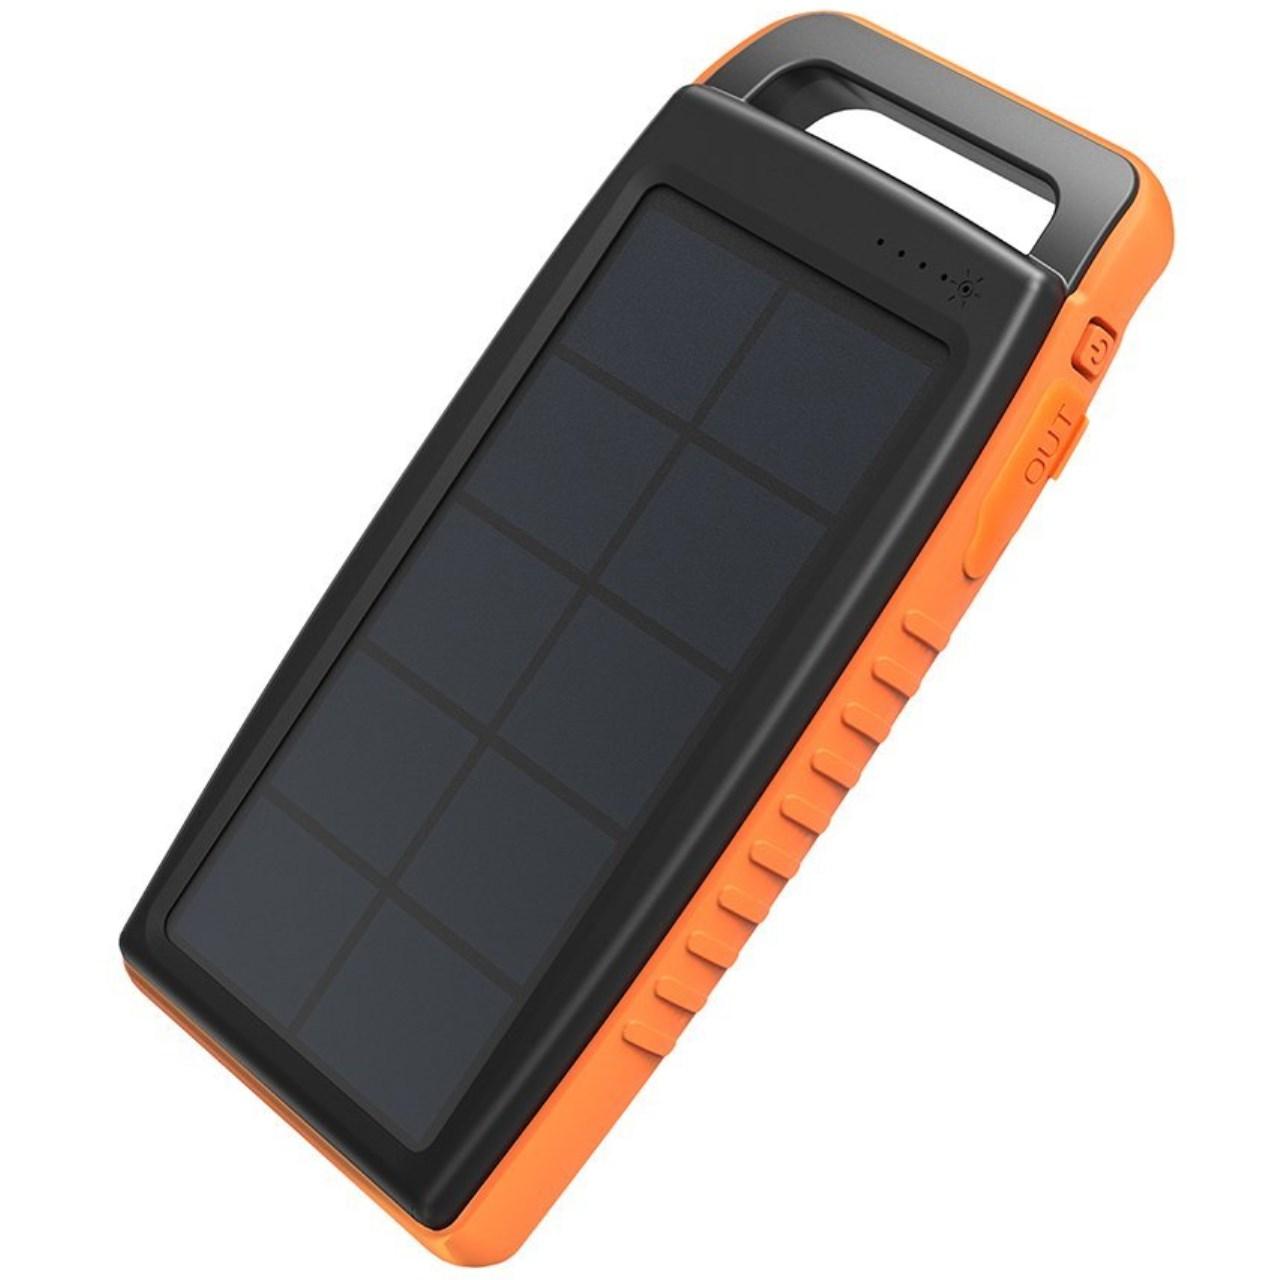 شارژر همراه خورشیدی راو پاور مدل RP-PB003 ظرفیت 15000 میلی آمپر ساعت